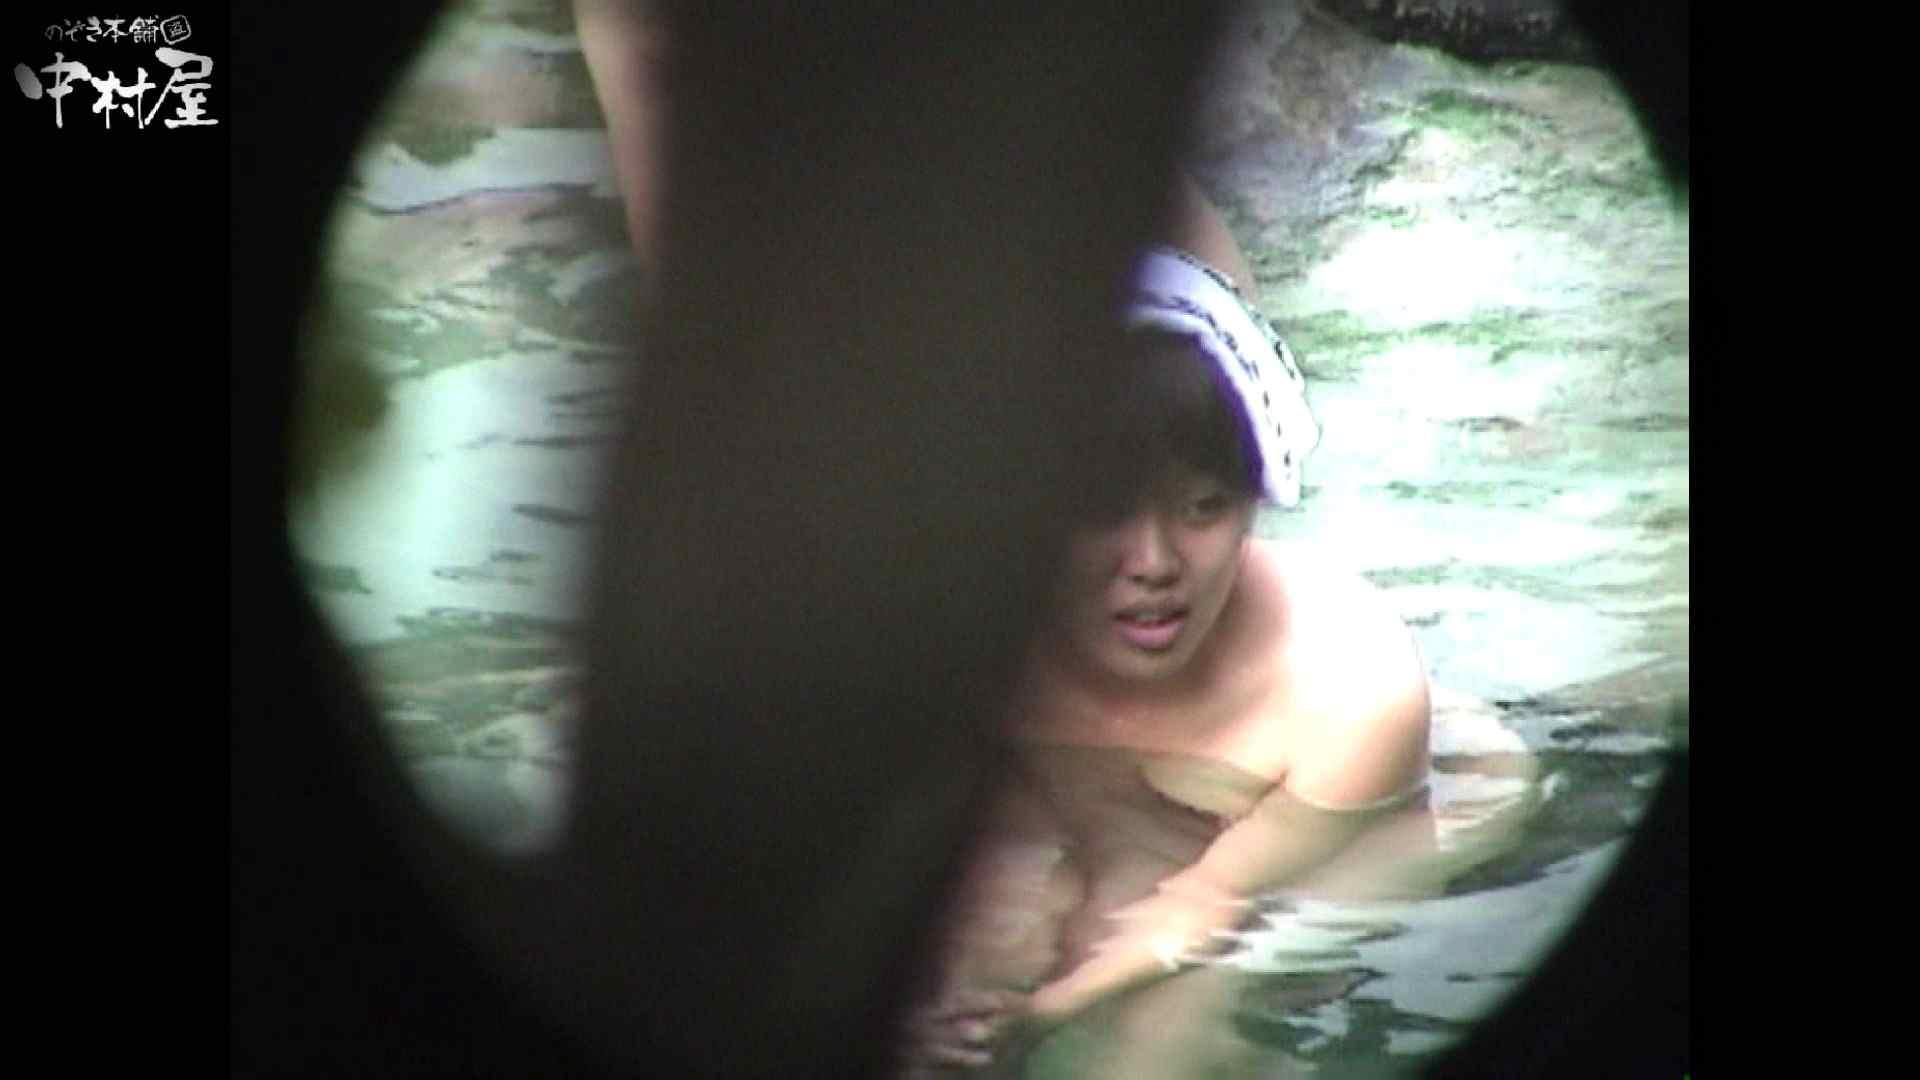 Aquaな露天風呂Vol.954 露天風呂編  111PIX 58